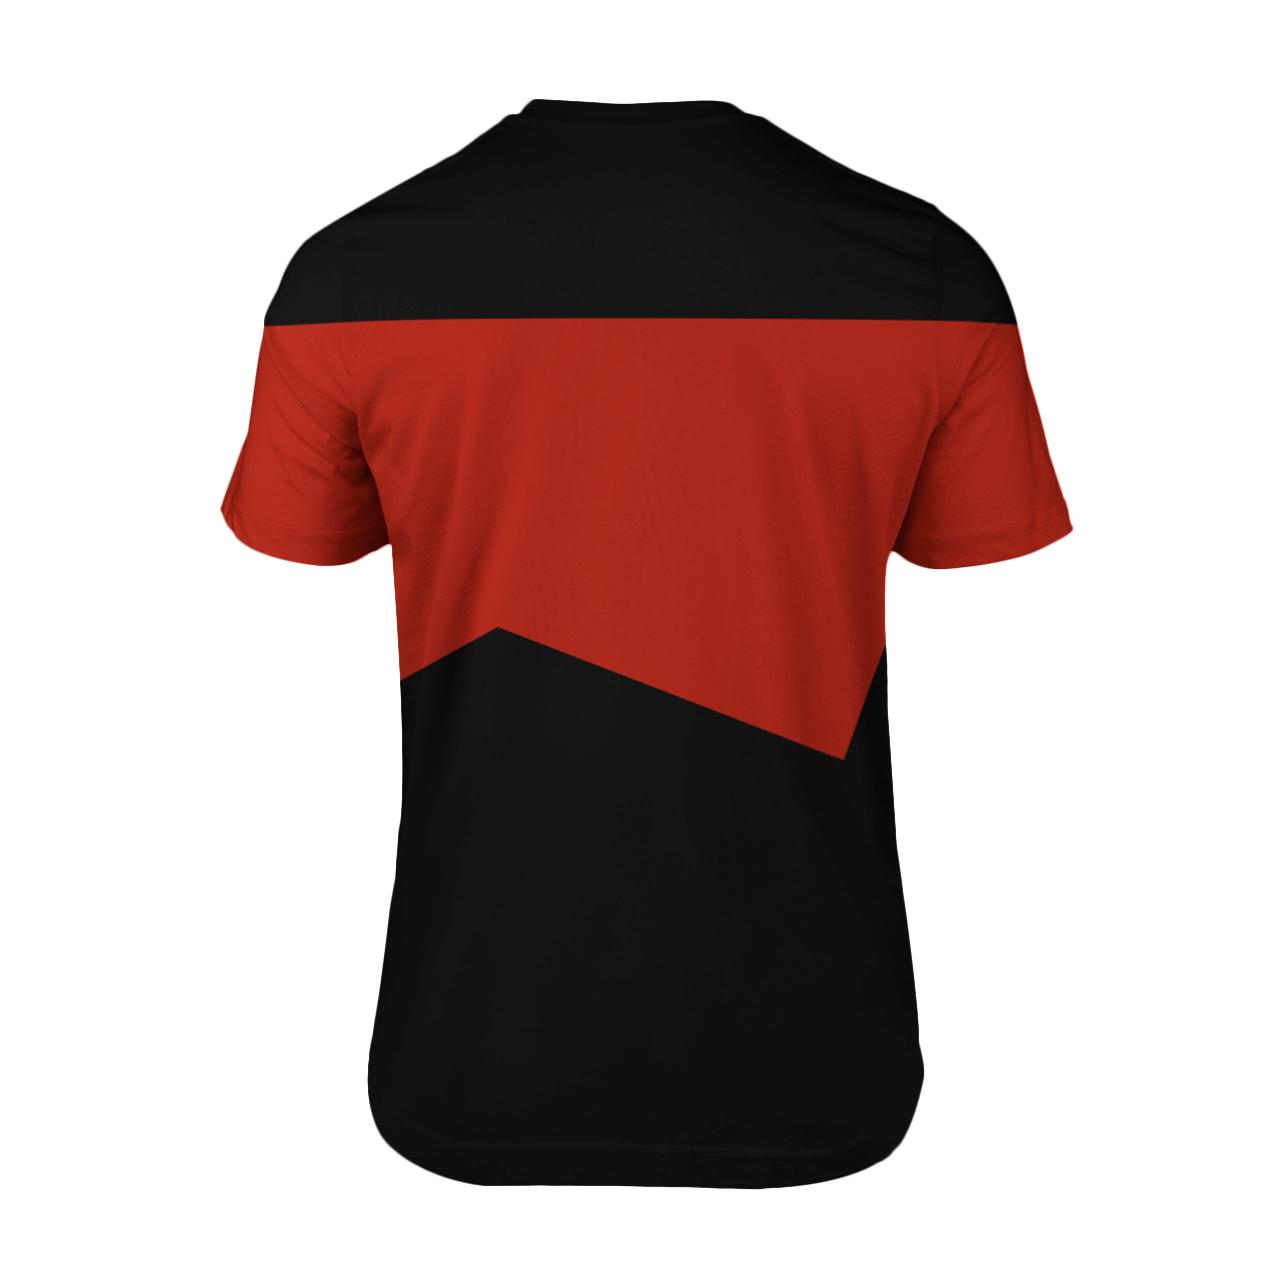 Star Trek captain 3d shirt 1.2